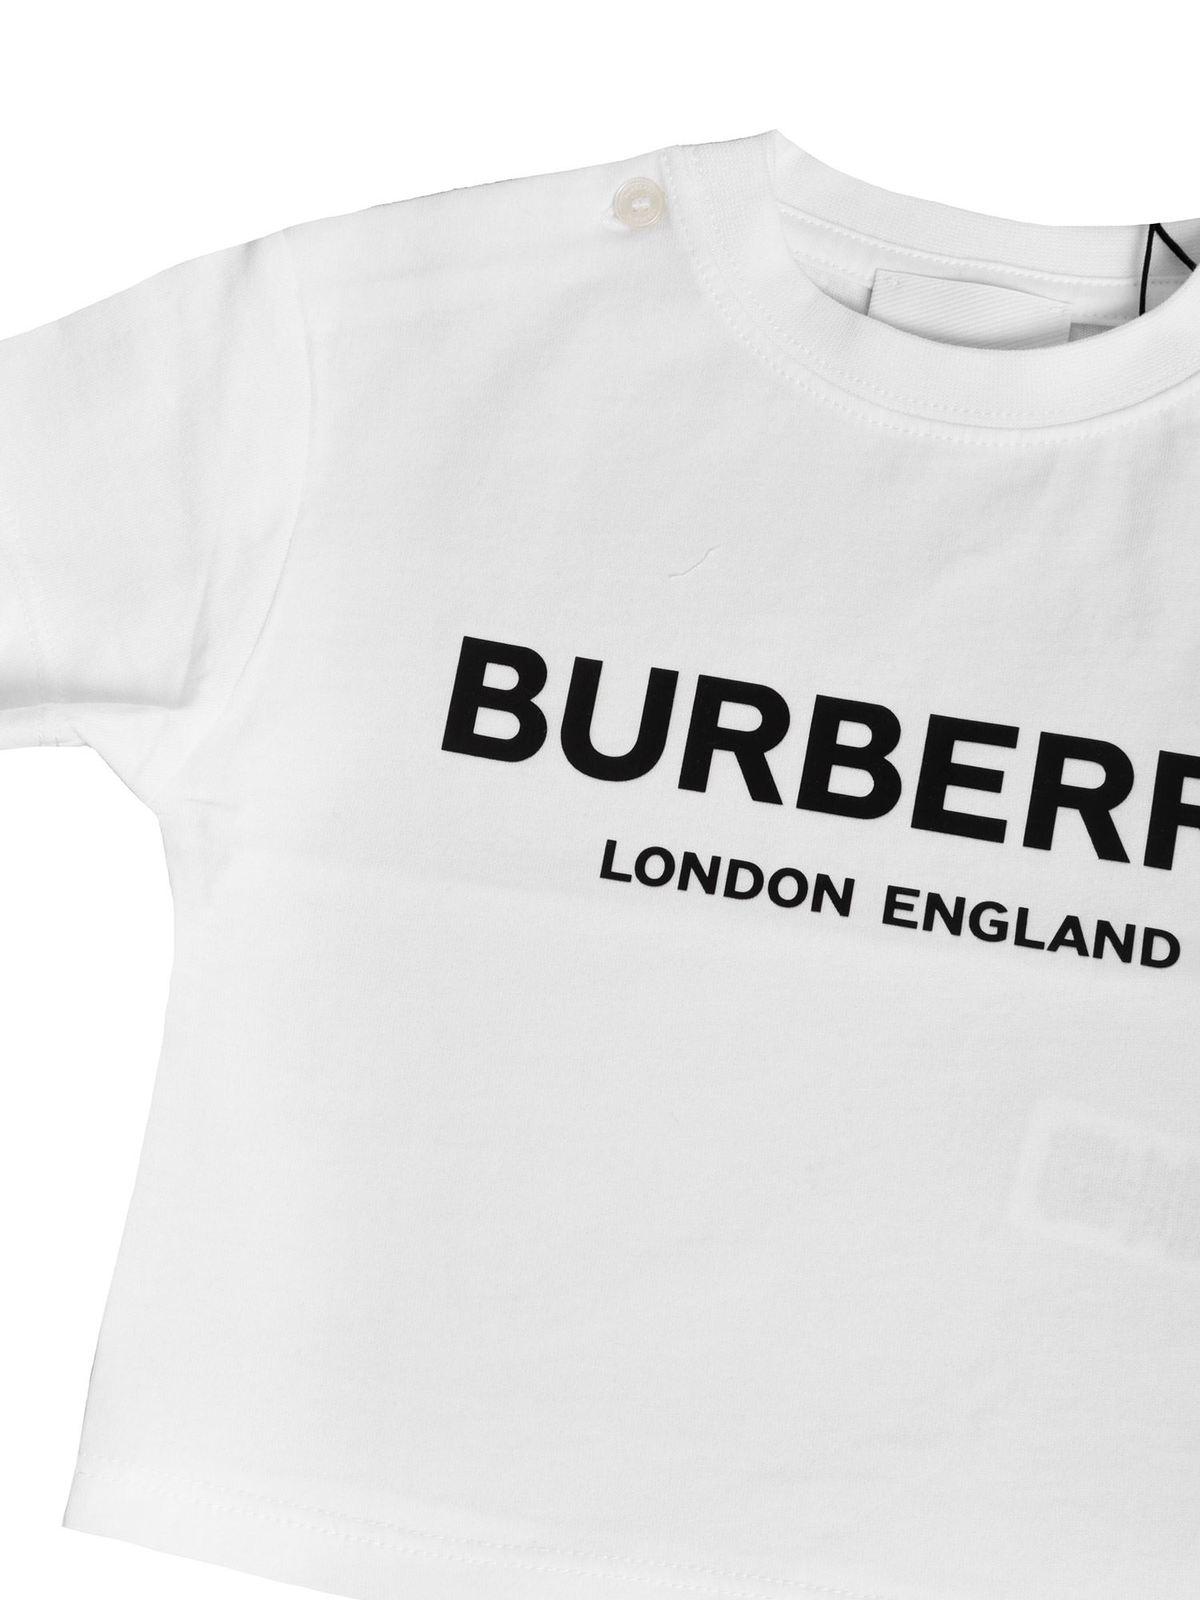 Burberry t shirt with logo print